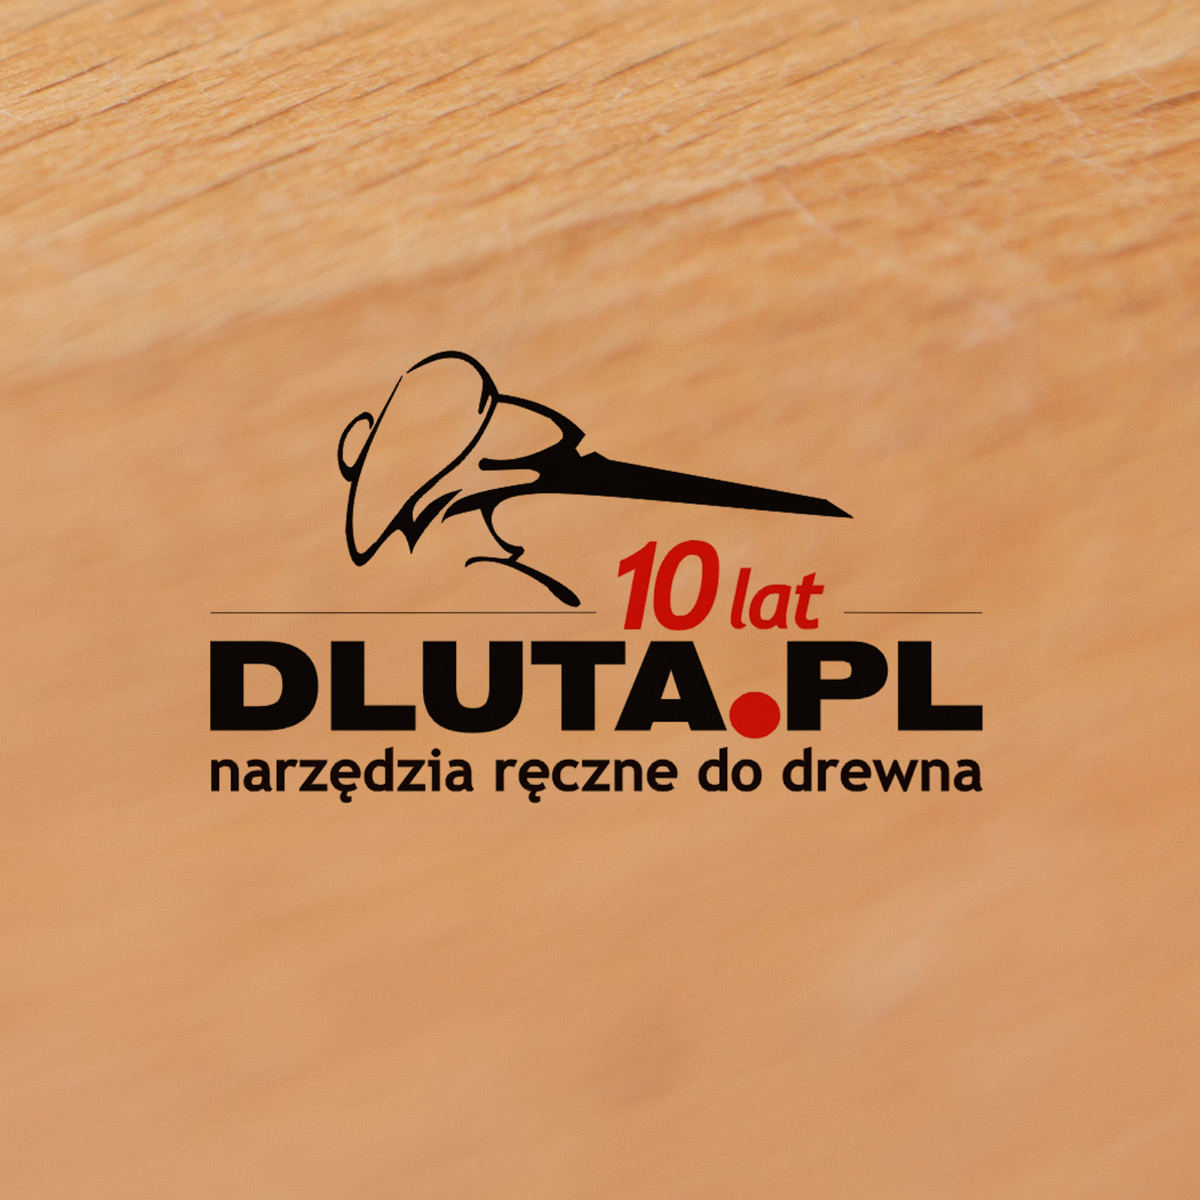 DLUTA.PL